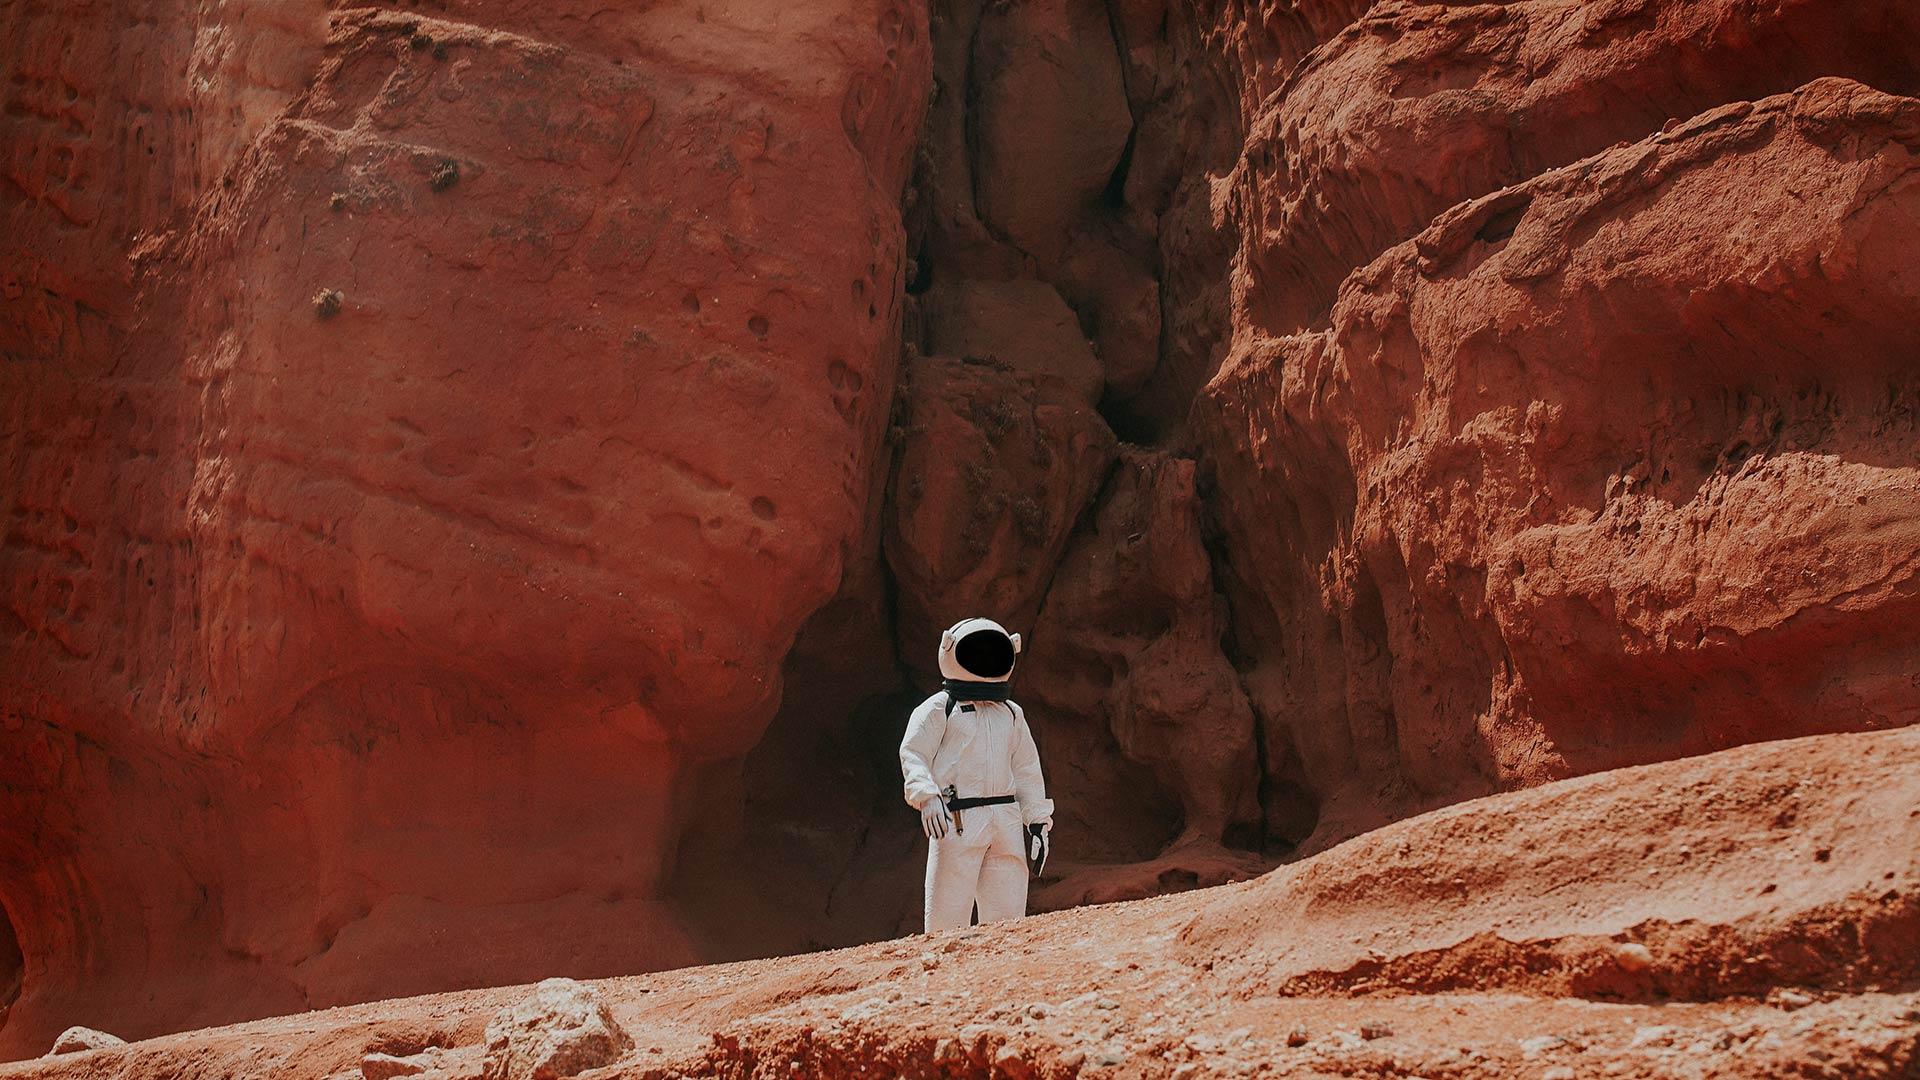 Astronauta en Marte - Image: Unsplash